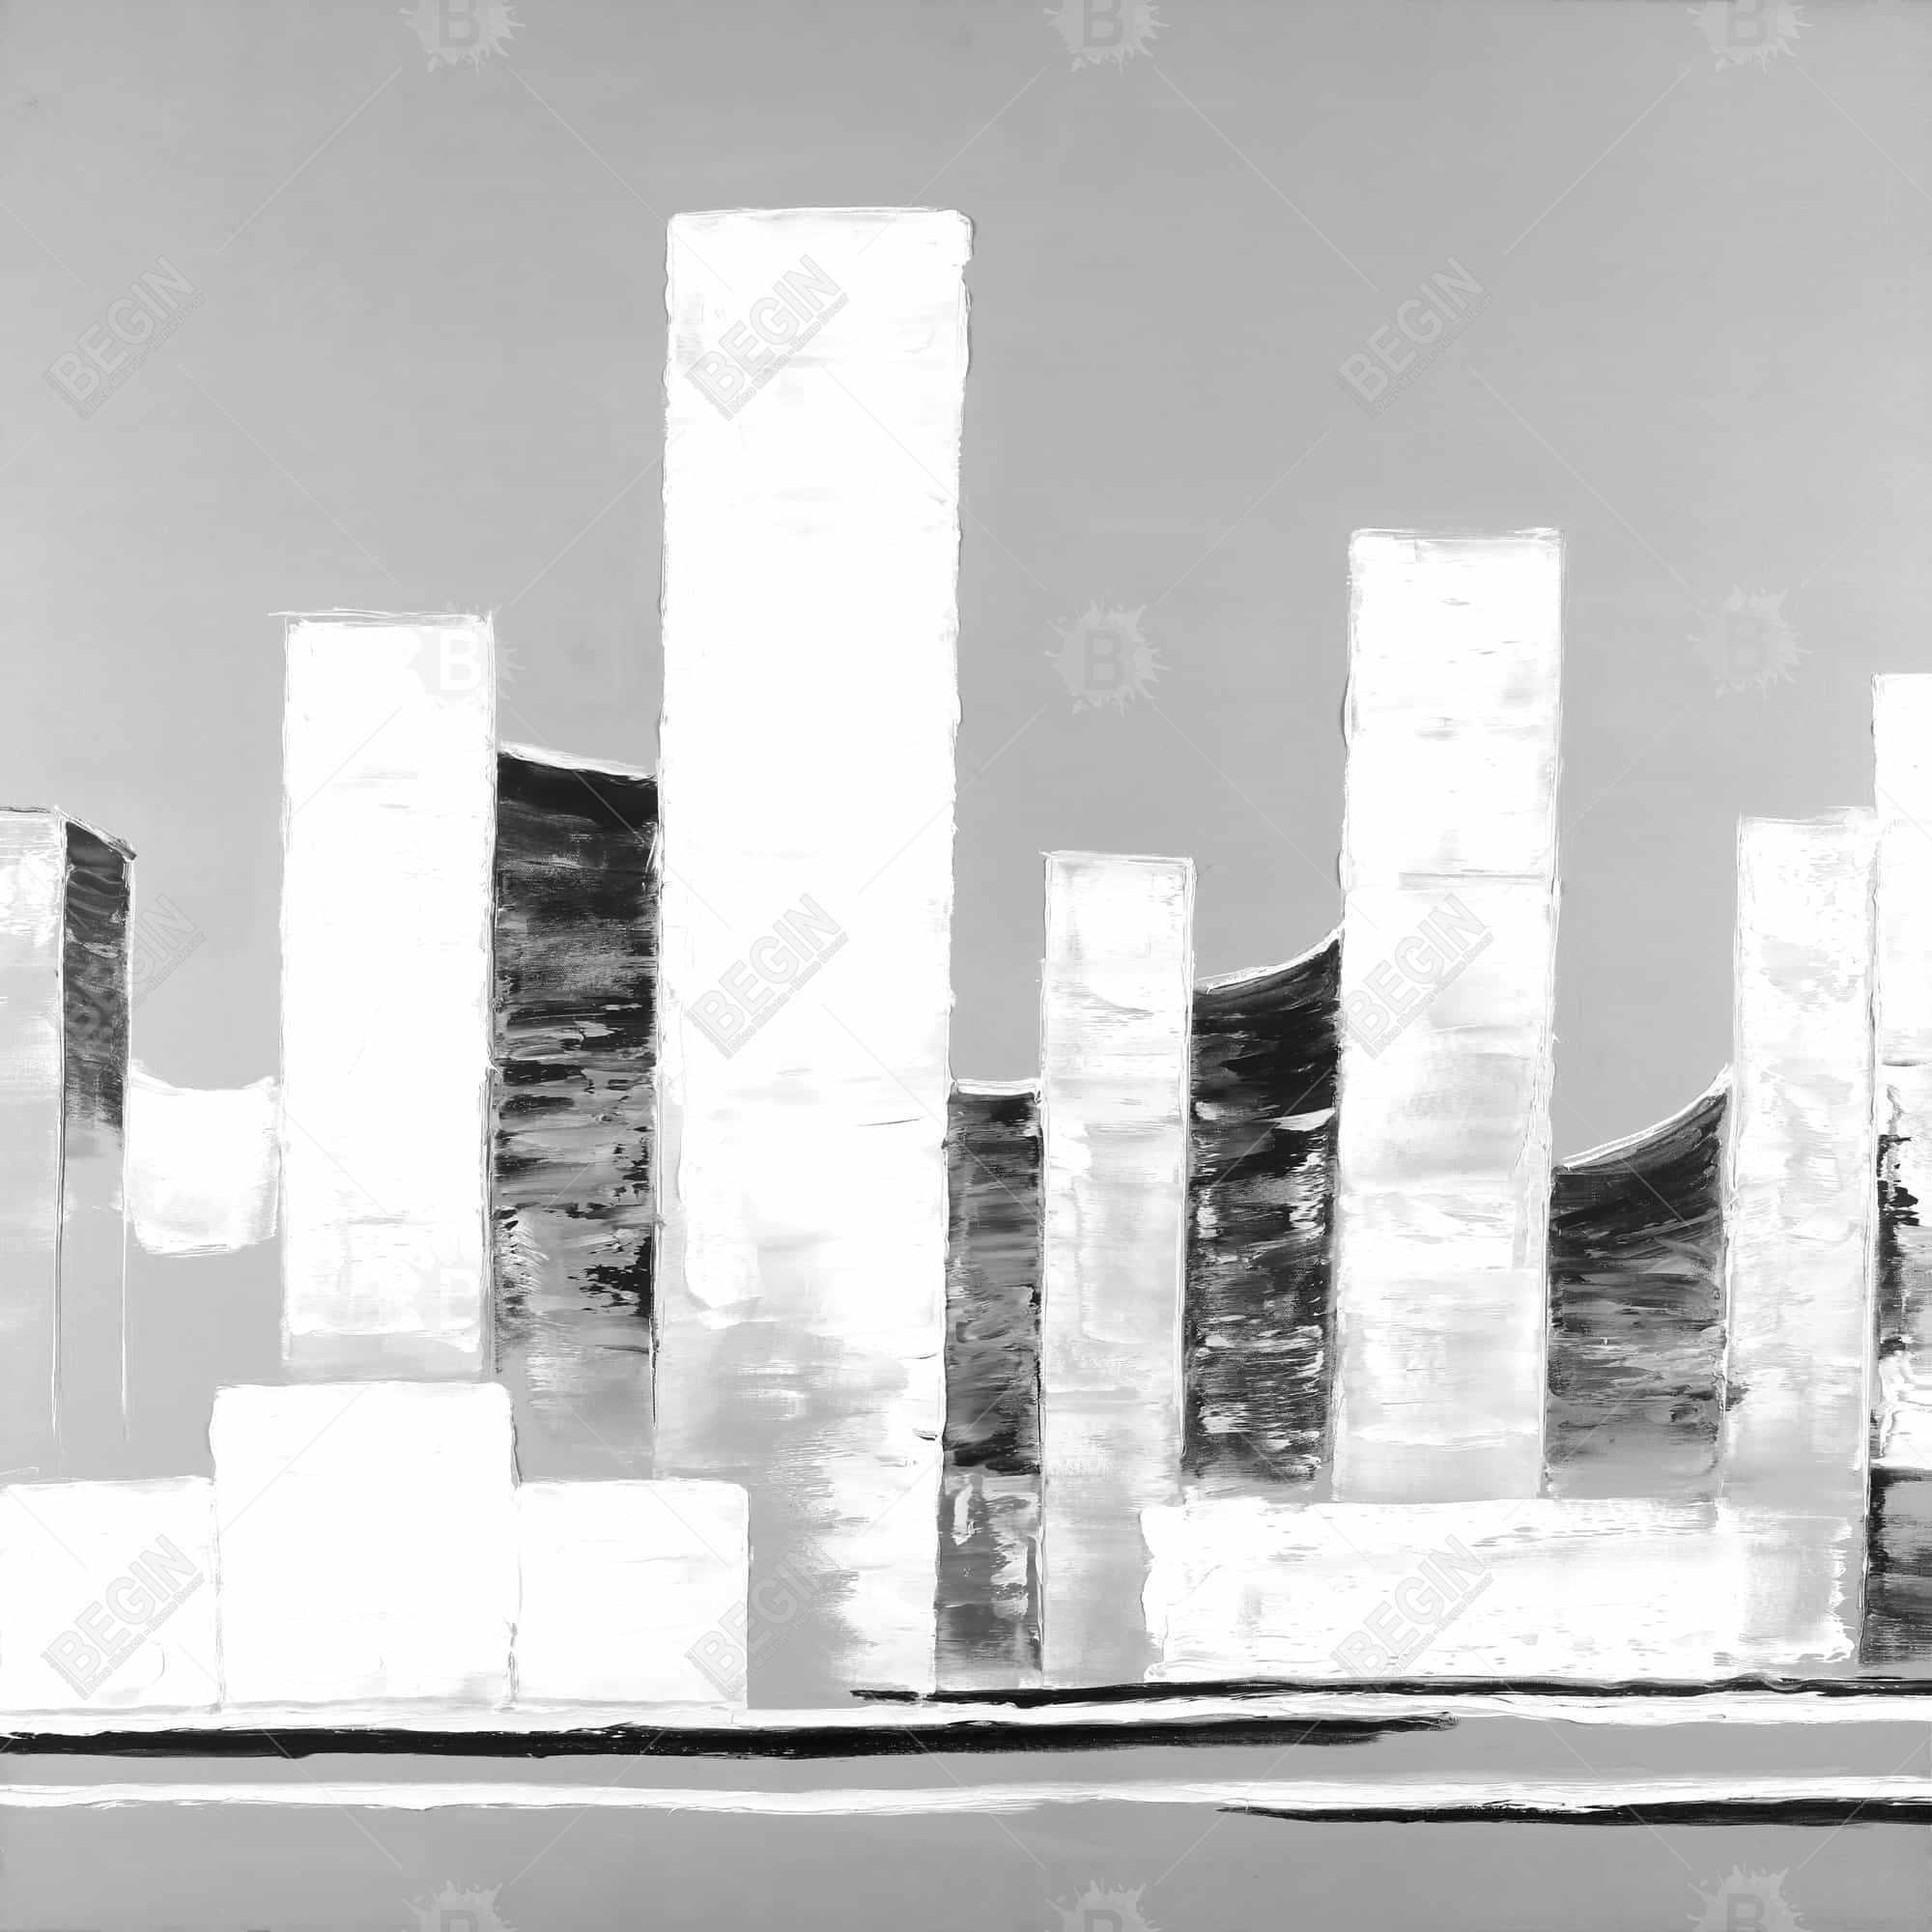 Minimalist abstract buildings